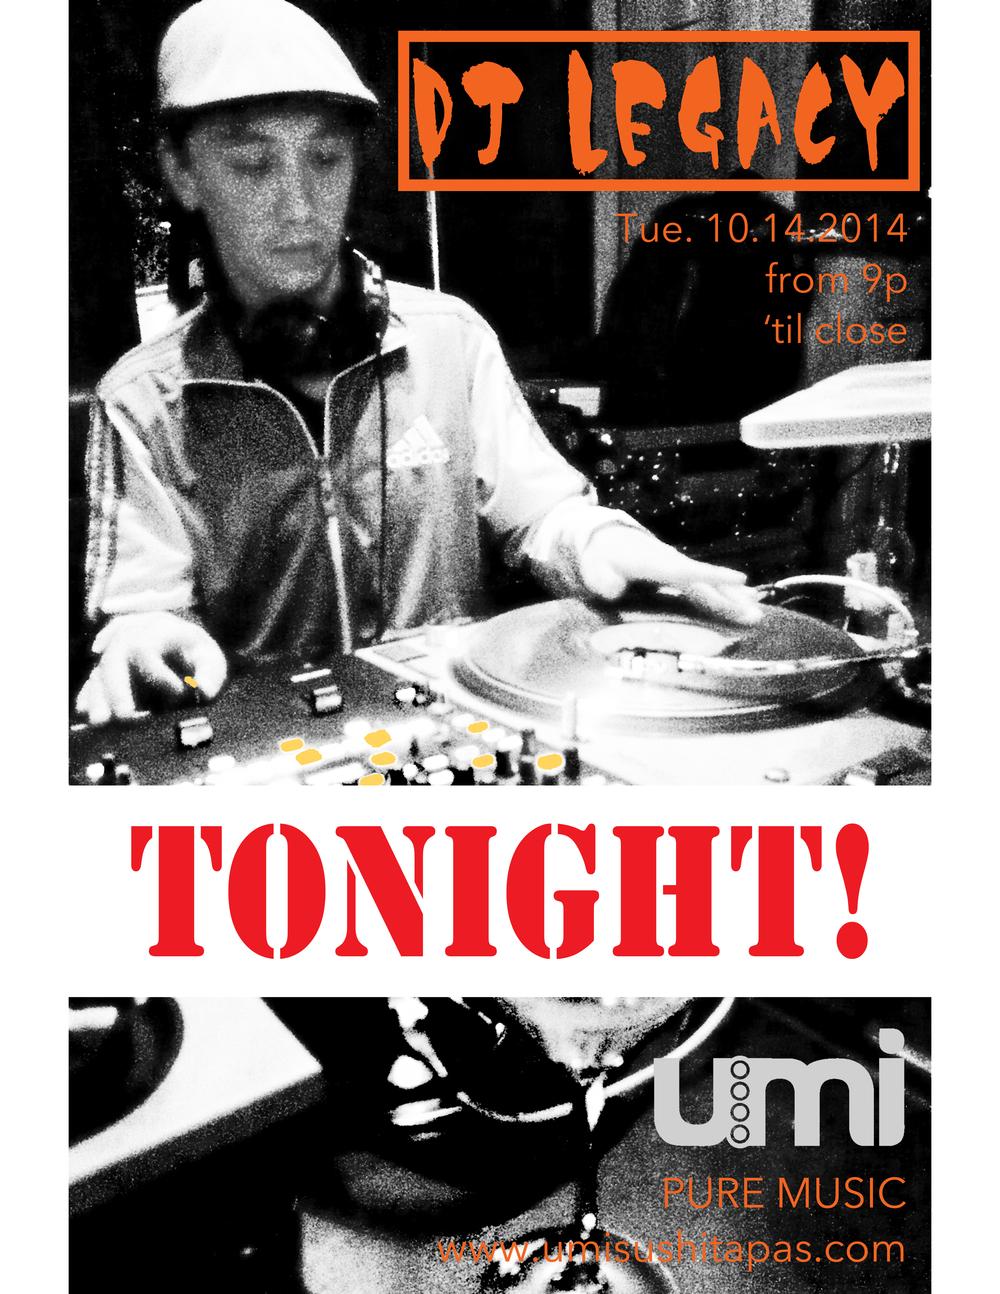 DJ Legacy - GIG1 at Umi